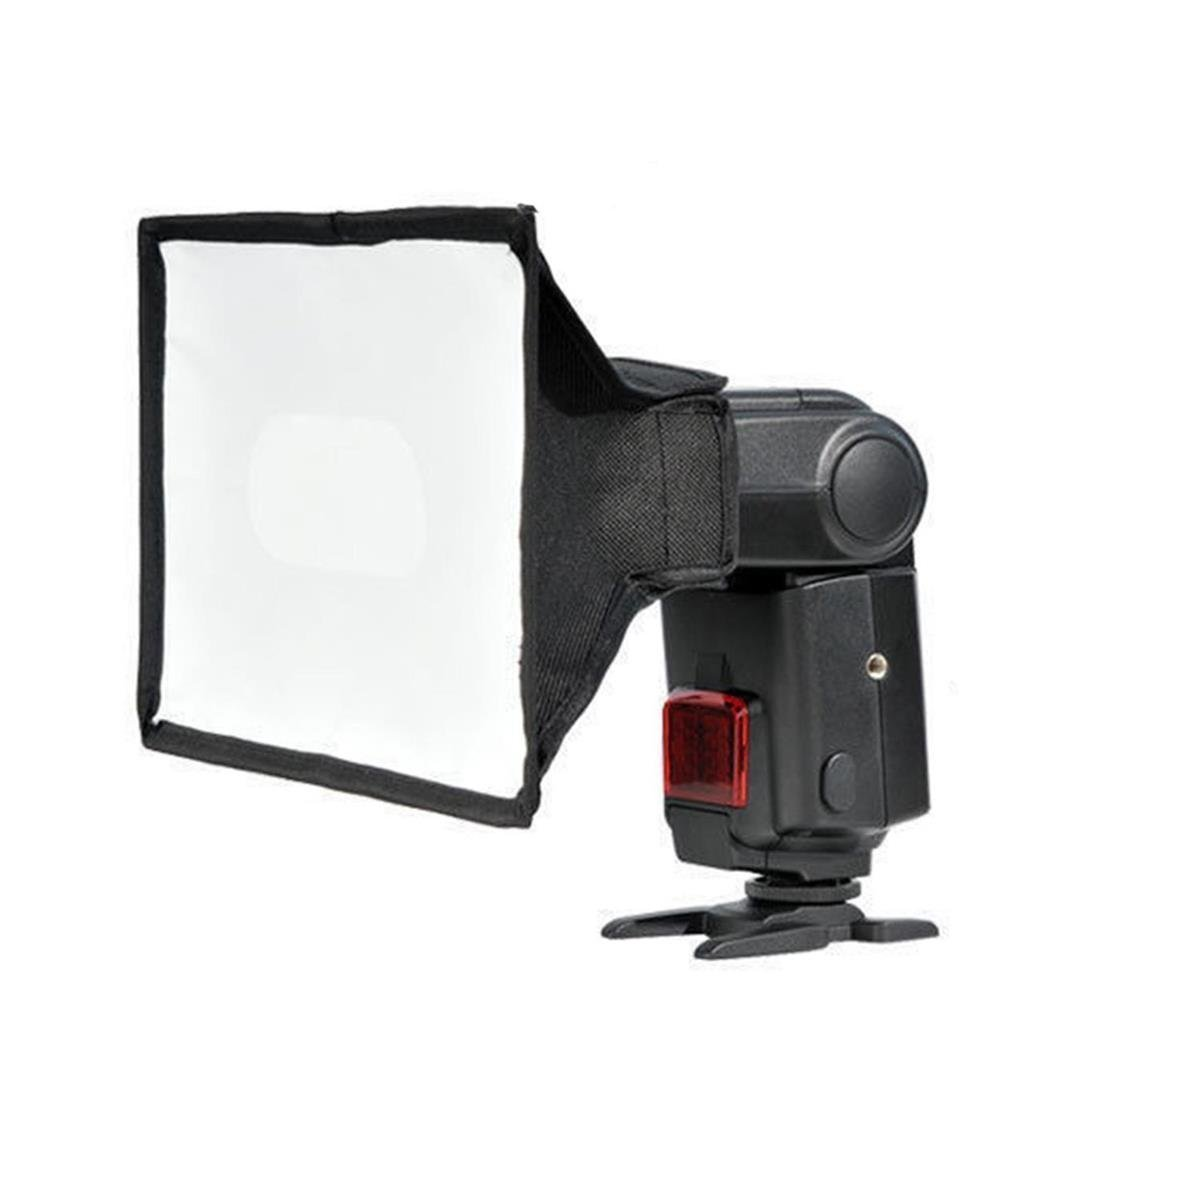 Flash Diffuser for Canon 600EX-RT Flash JJC Camera Flash Bounce Light Diffuser Portable Durable for Canon DSLR Camera Flash Speedlight-2 Pack